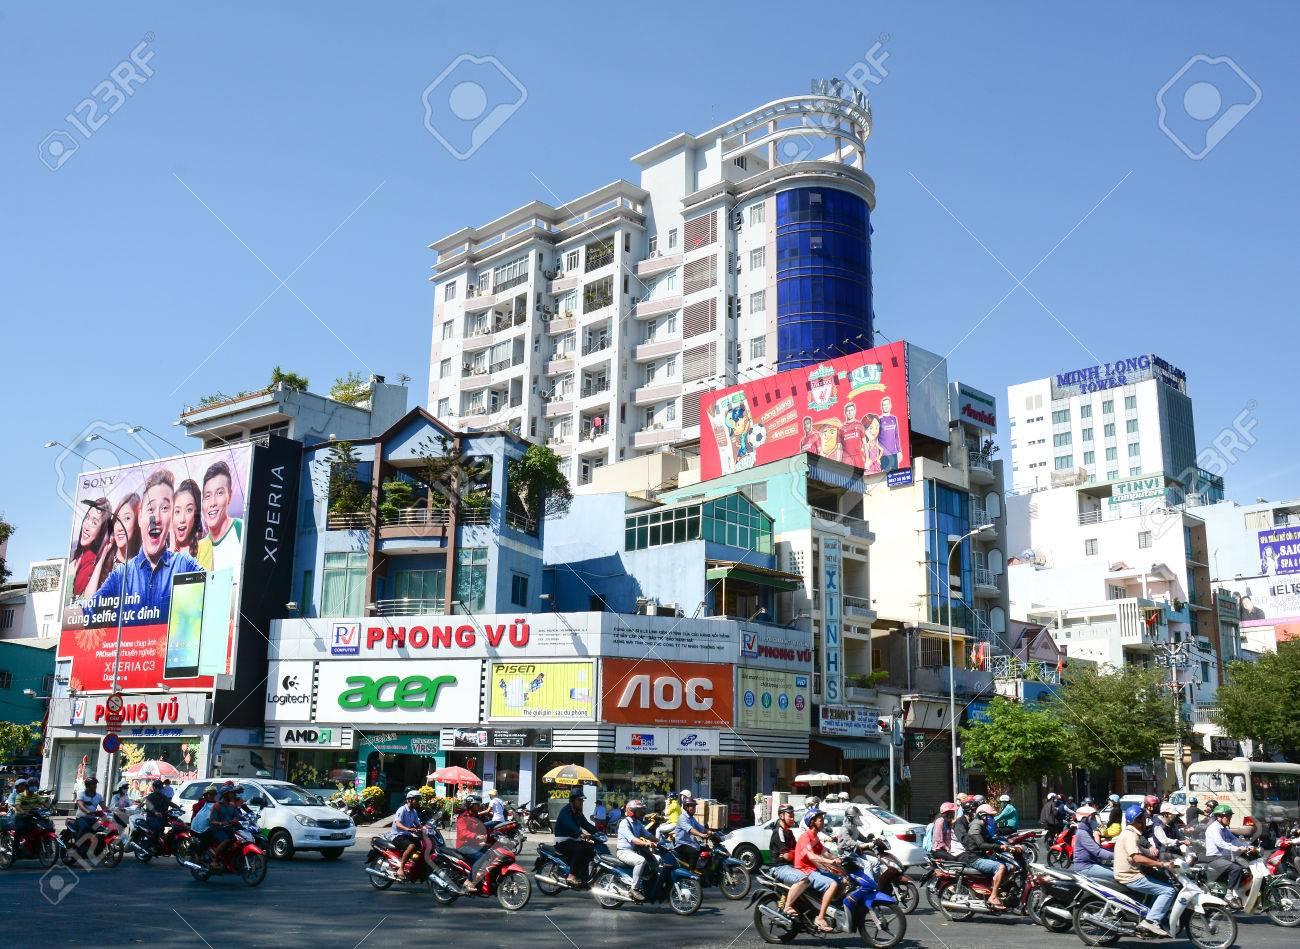 SAIGON, VIETNAM - FEB 26, 2015: Road Traffic in Saigon (Ho Chi Minh City), Vietnam. Ho Chi Minh is the biggest city in Southern of Vietnam. - 38220444